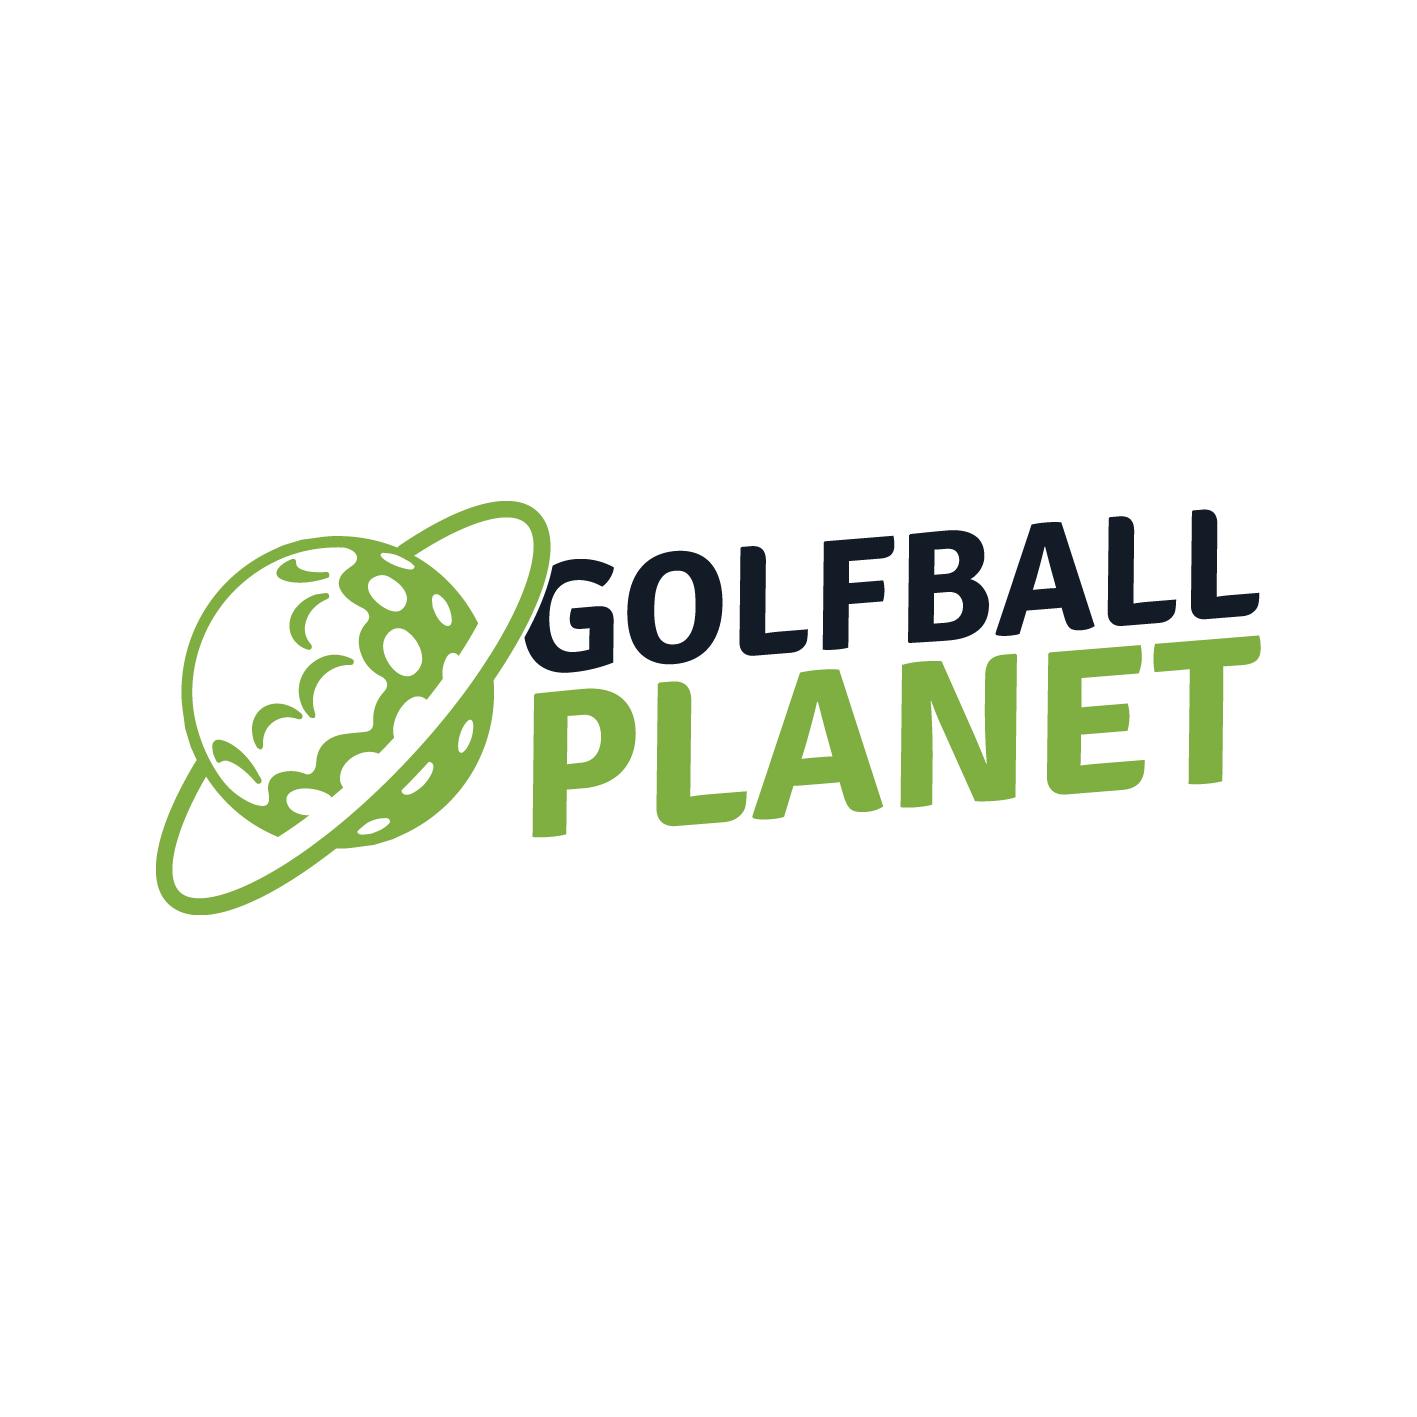 old golf ball planet logo